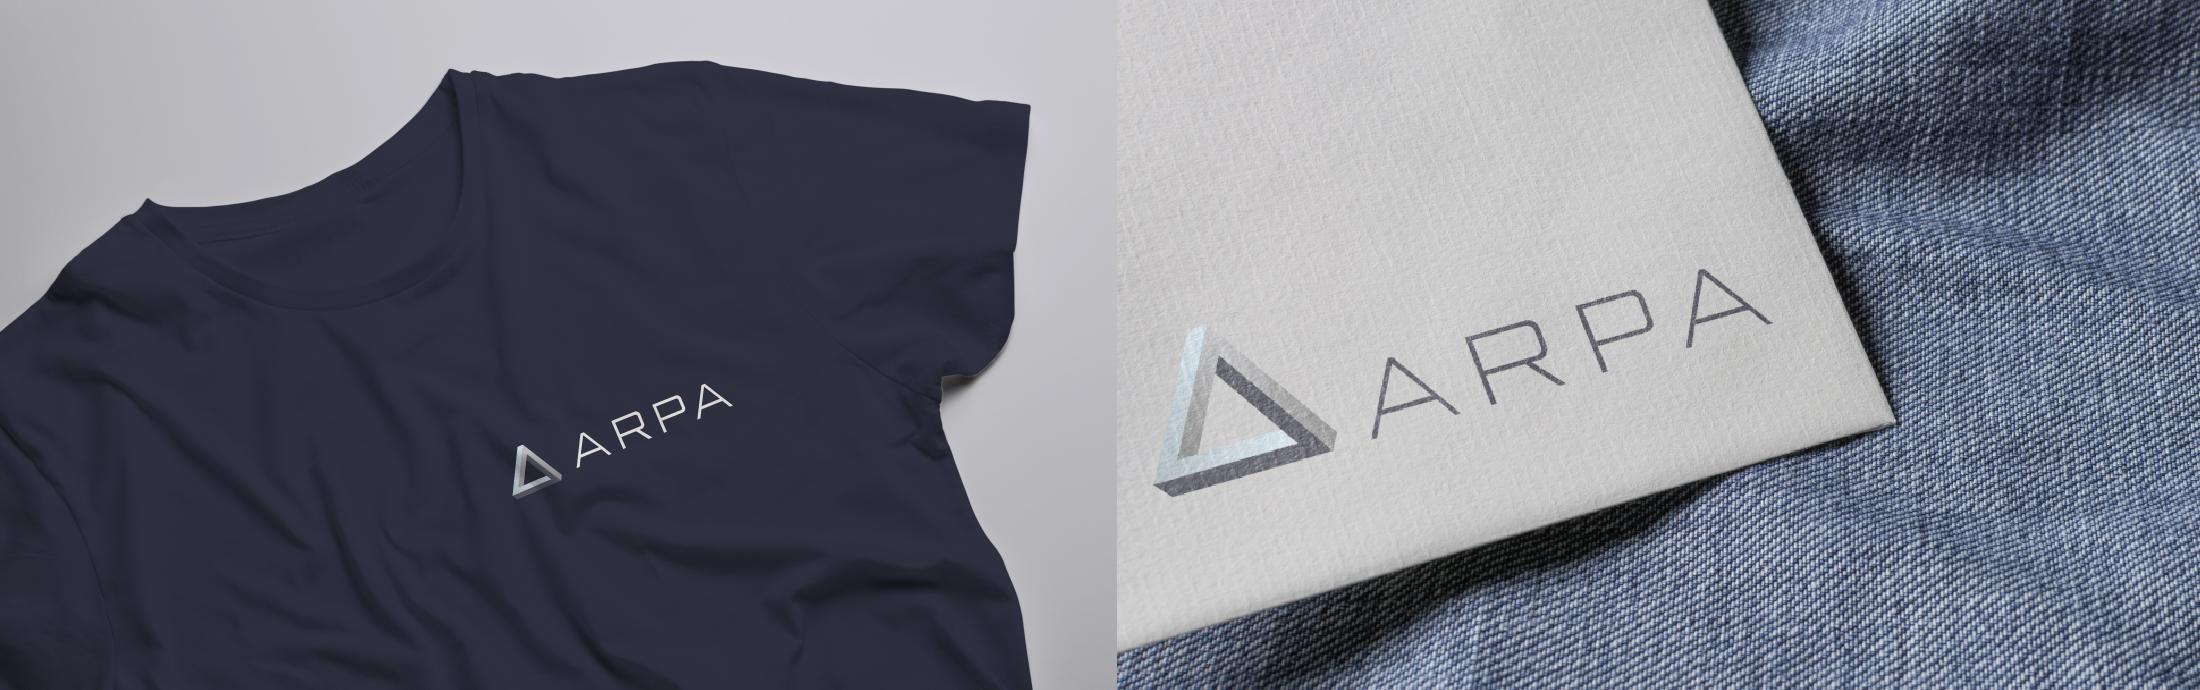 arpa-mockup-tshirt-paperprint-01